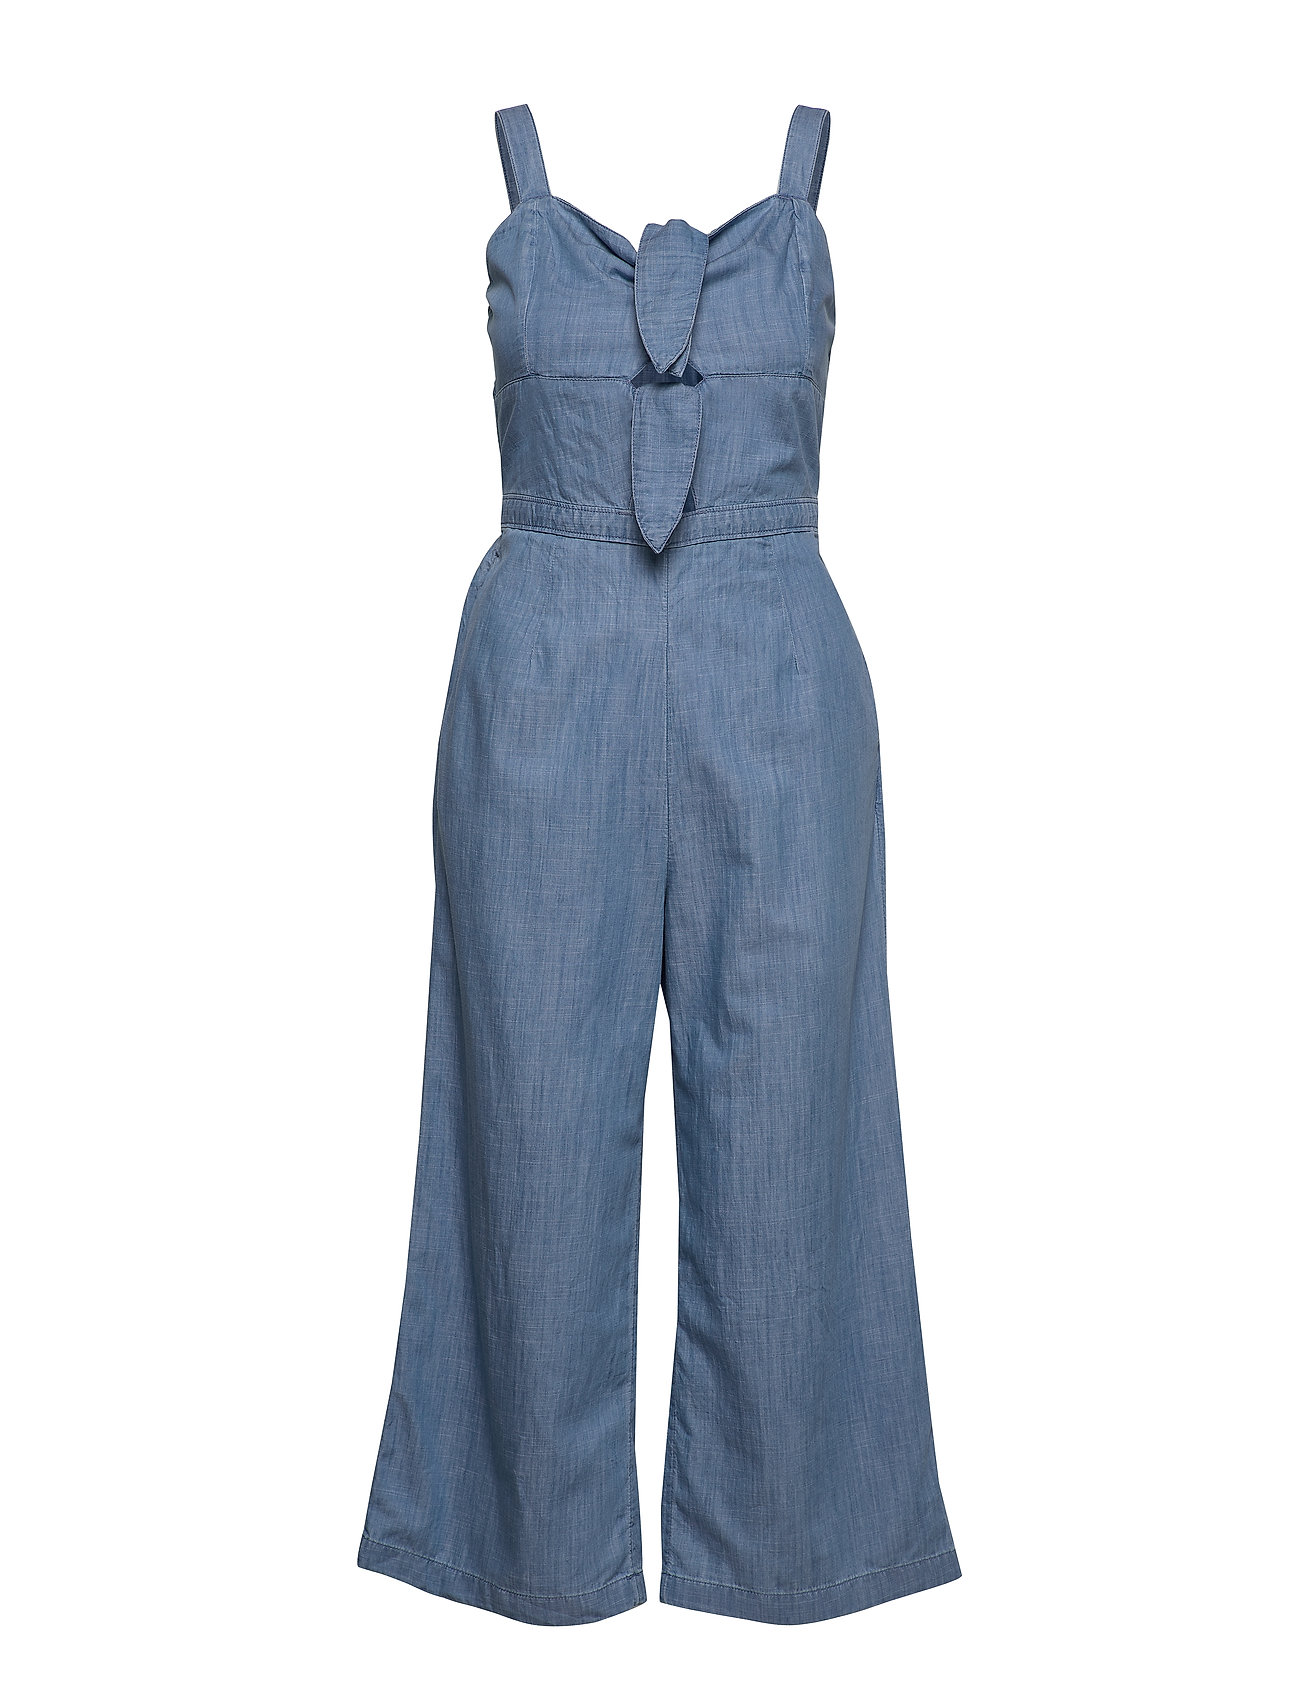 Hollister Double Tie Jumpsuit - MED BLUE DD